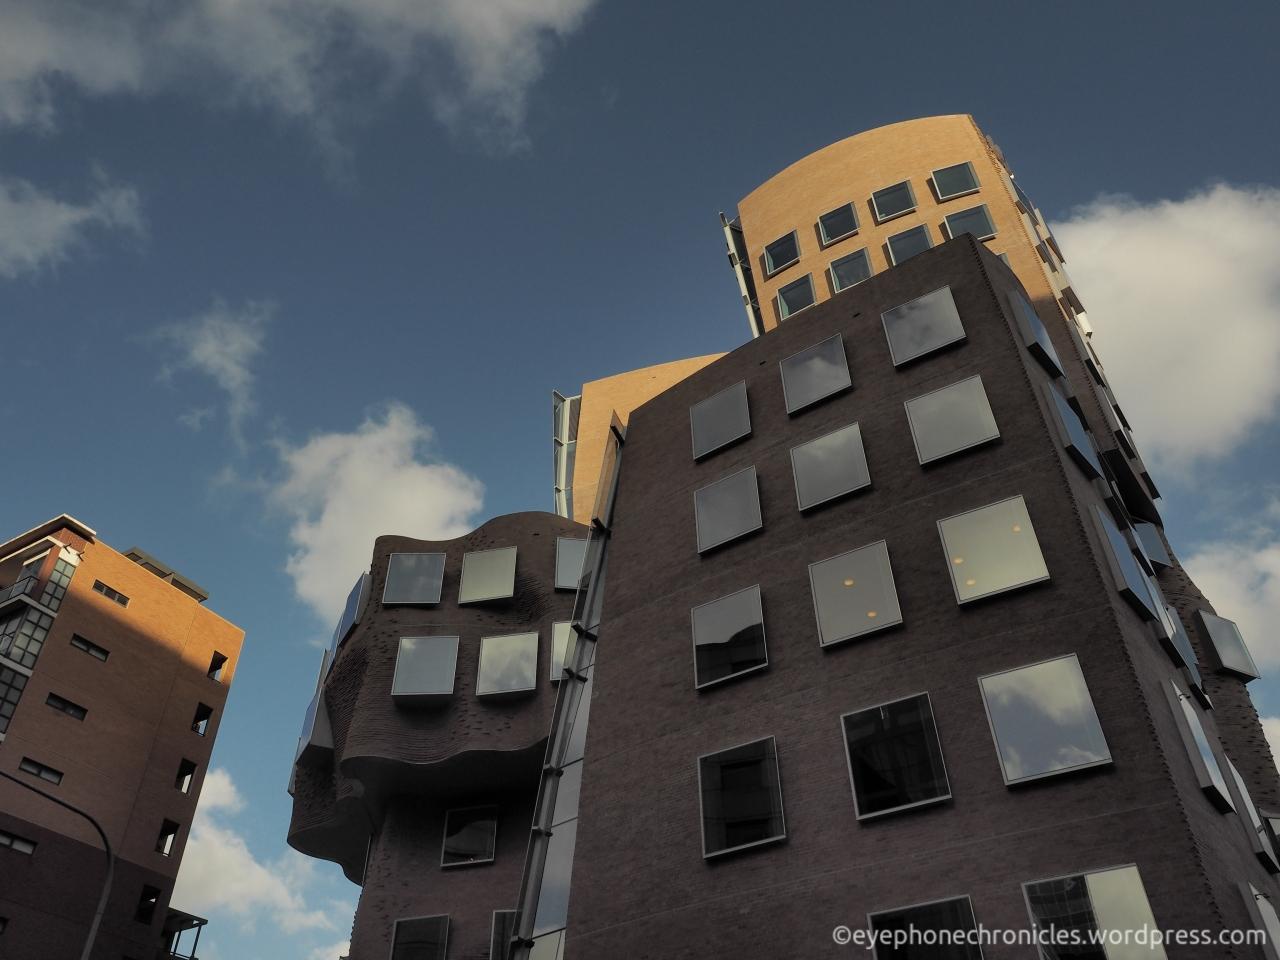 UTS-Chau Chak Wing building (2)